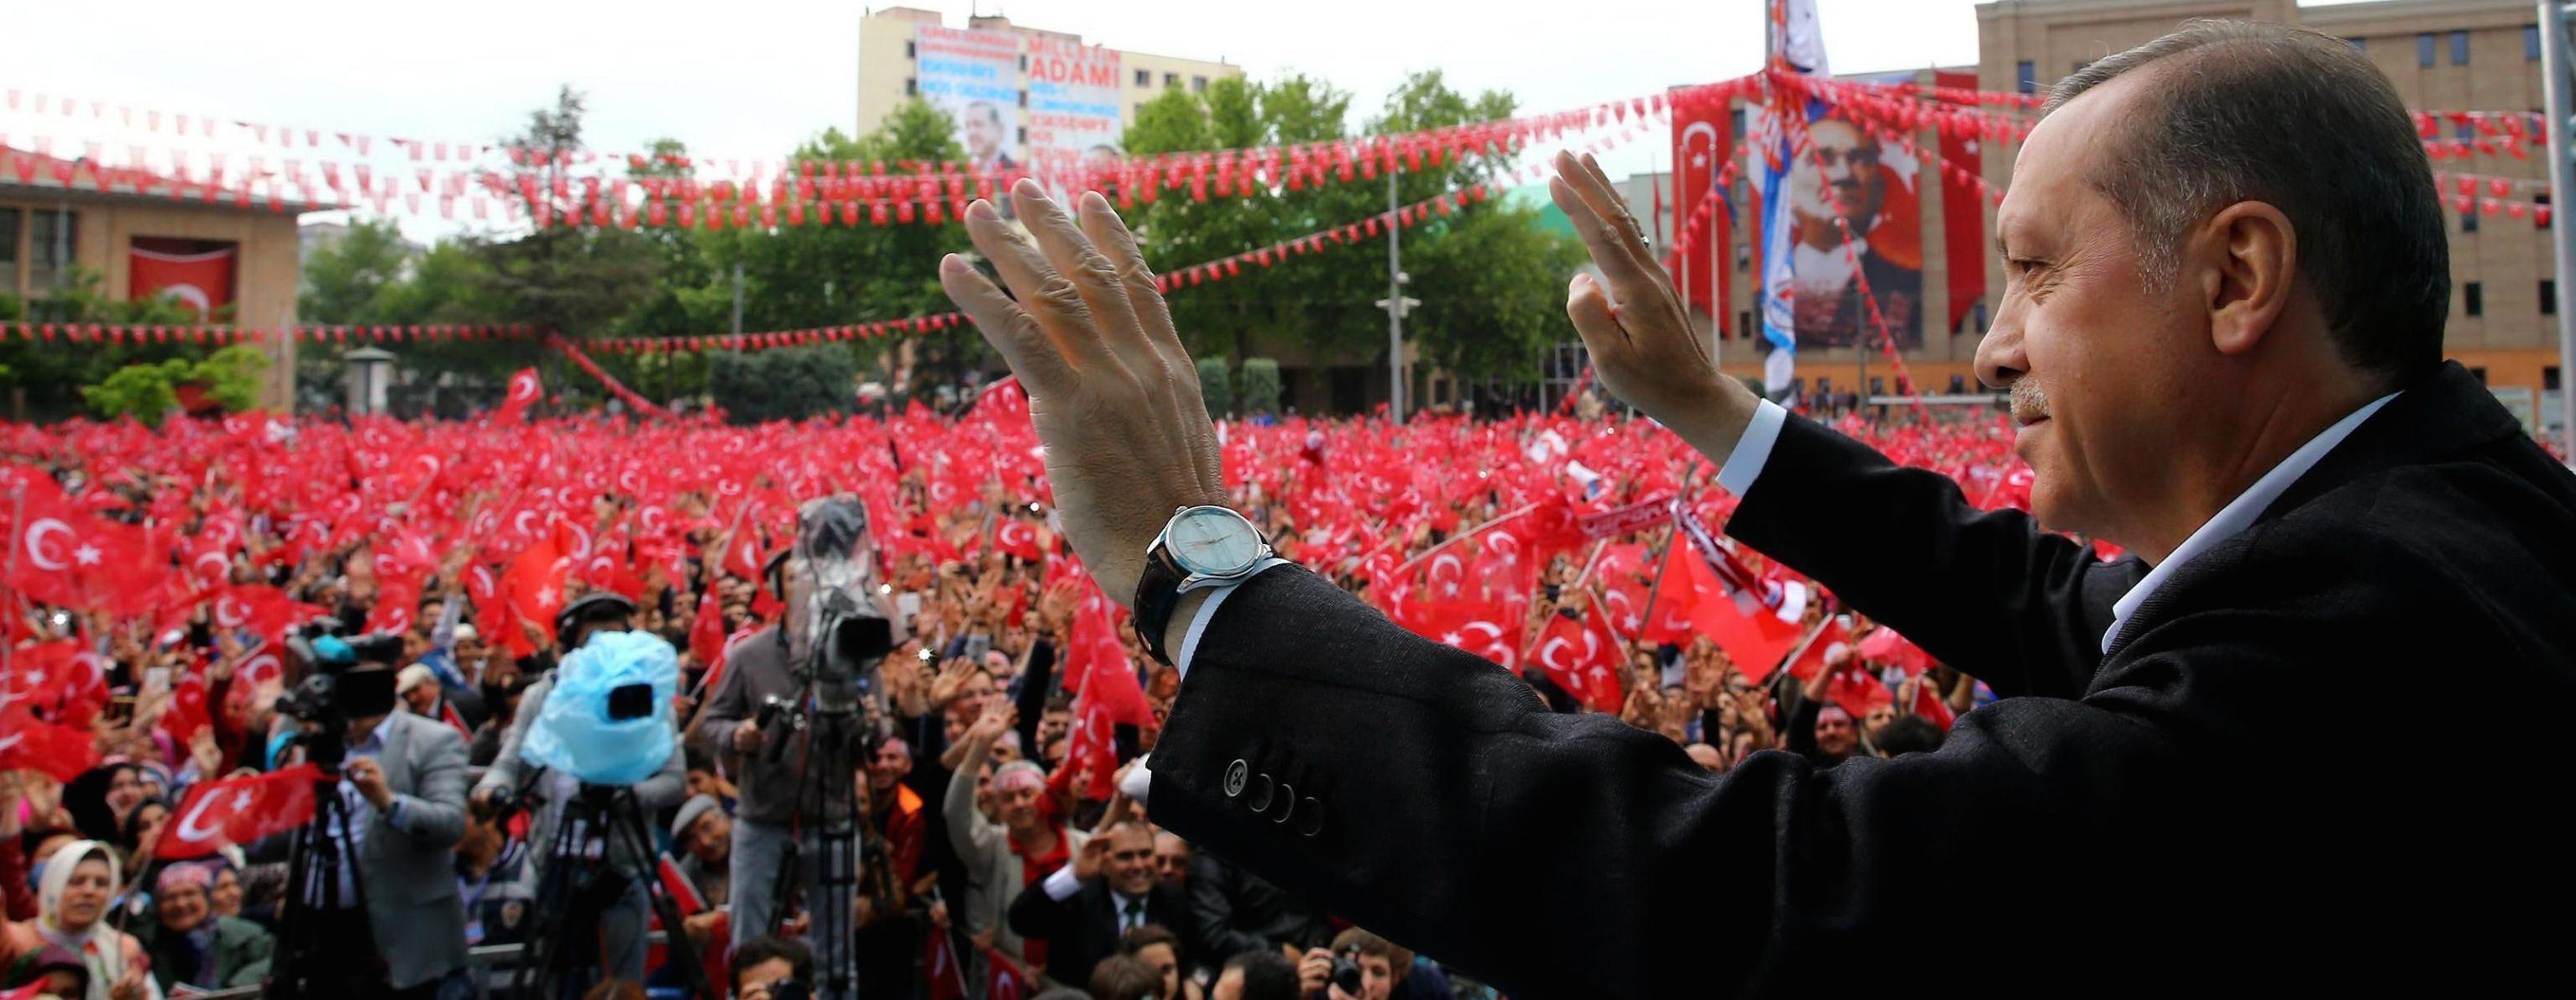 Il leader turco Erdogan